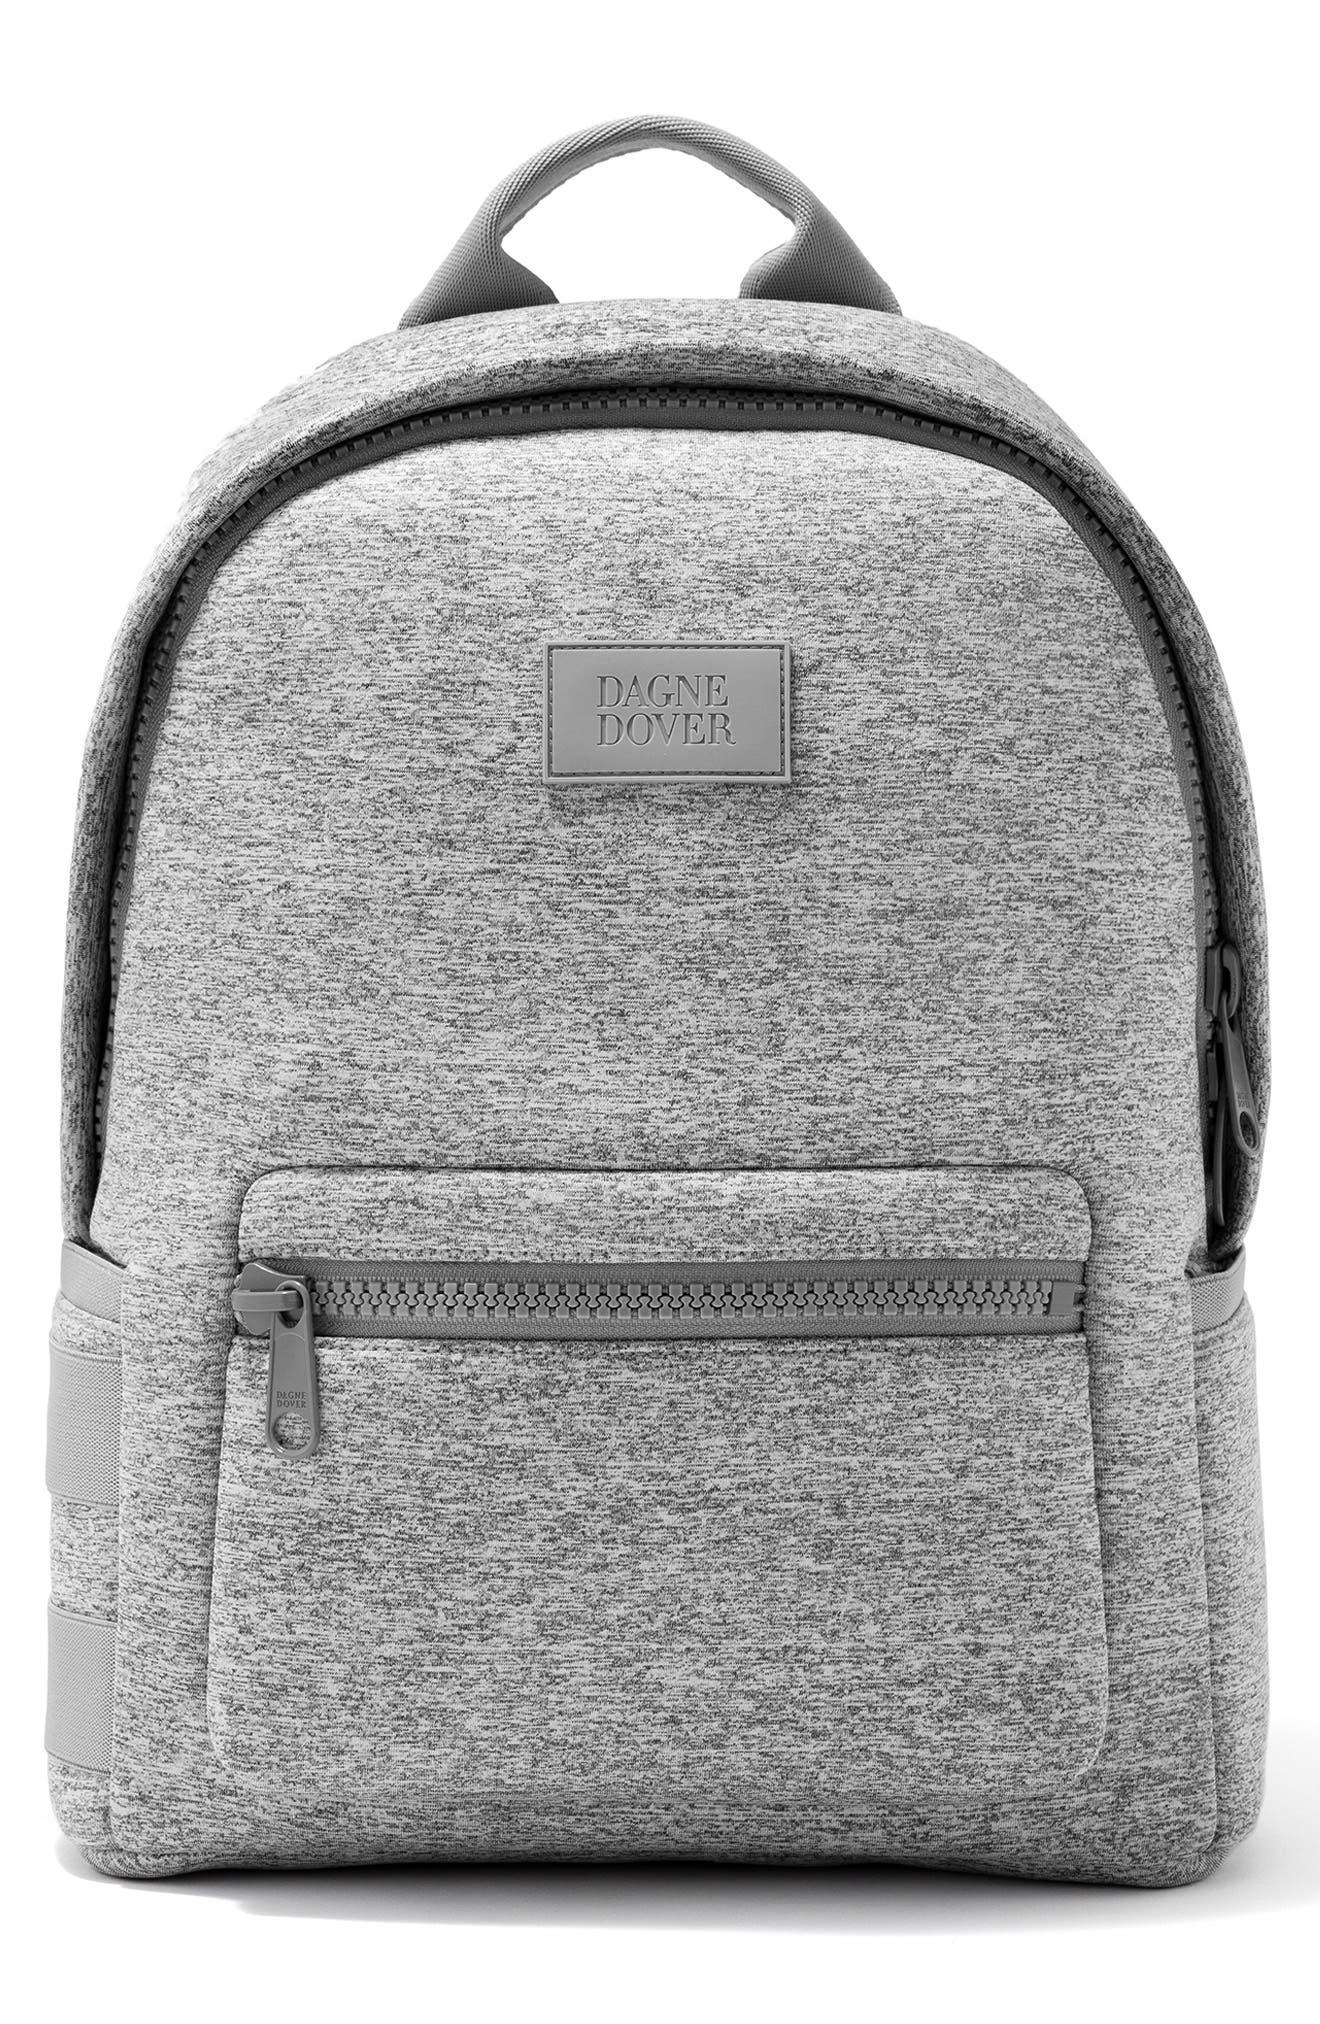 DAGNE DOVER 365 Dakota Neoprene Backpack, Main, color, HEATHER GREY